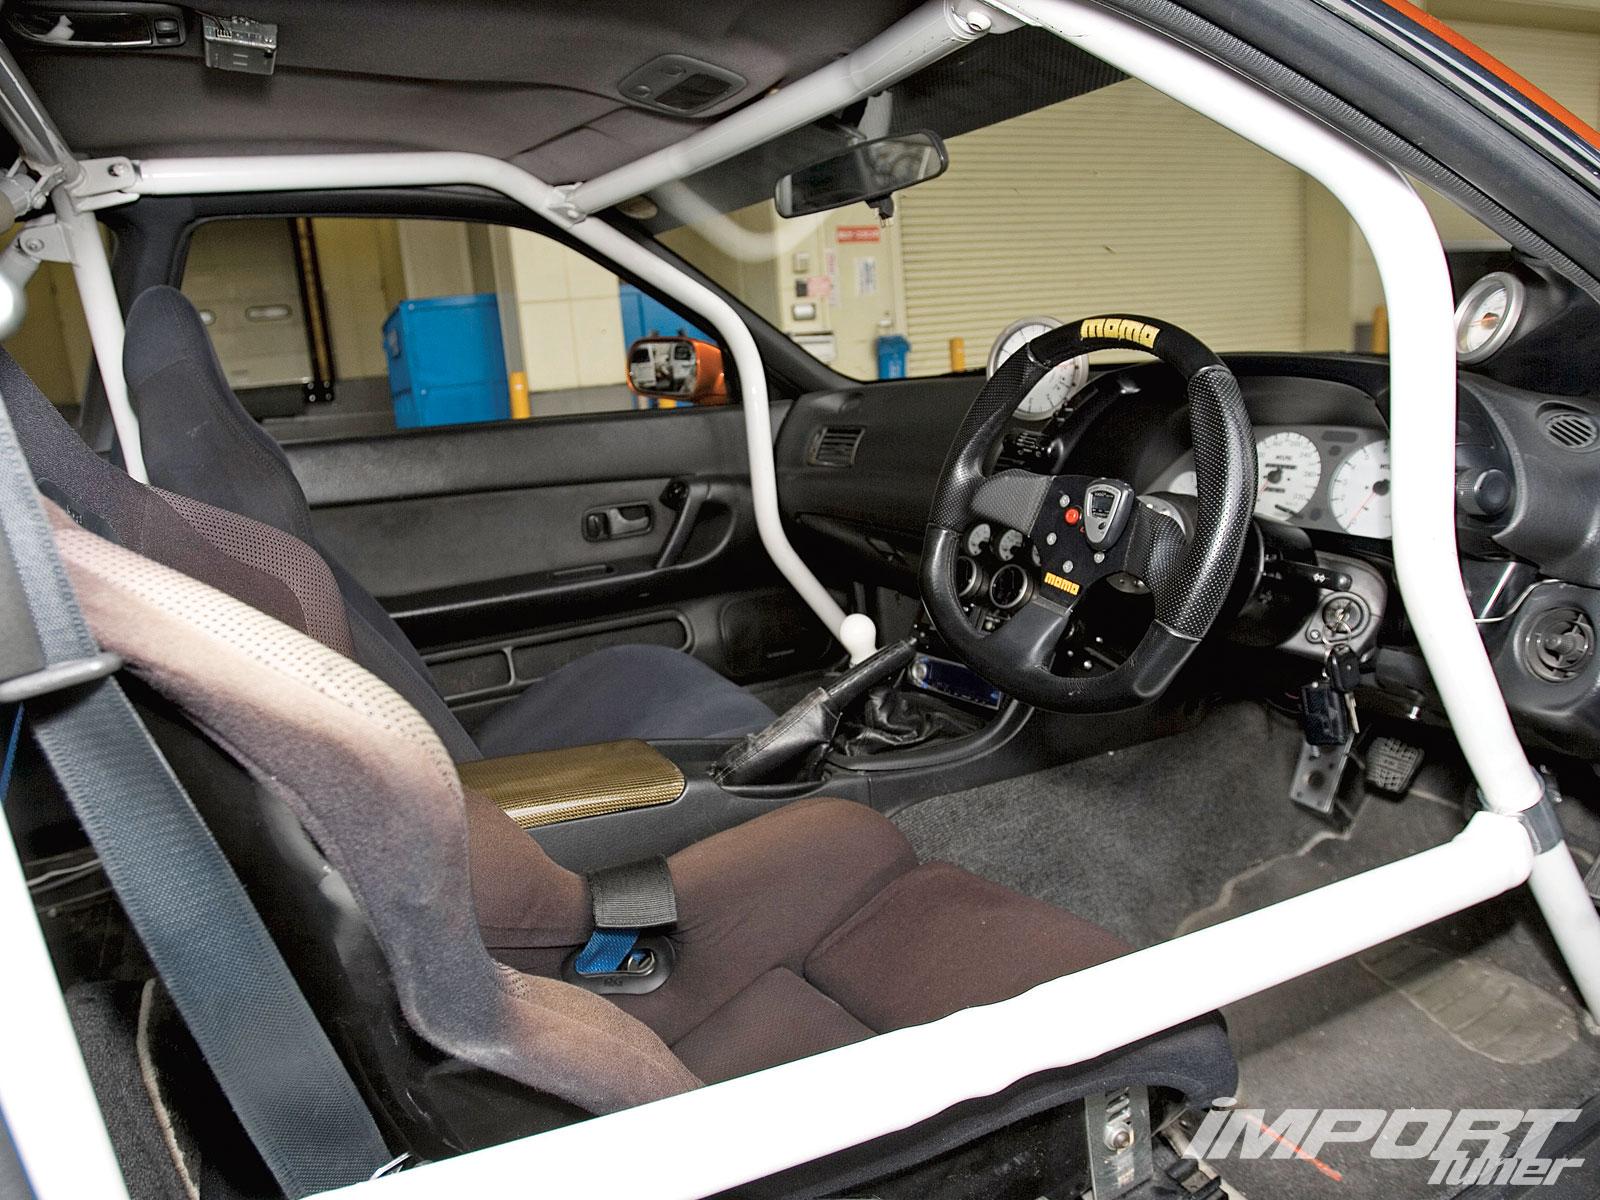 1990 Nissan Skyline - Interior Pictures - CarGurus 25